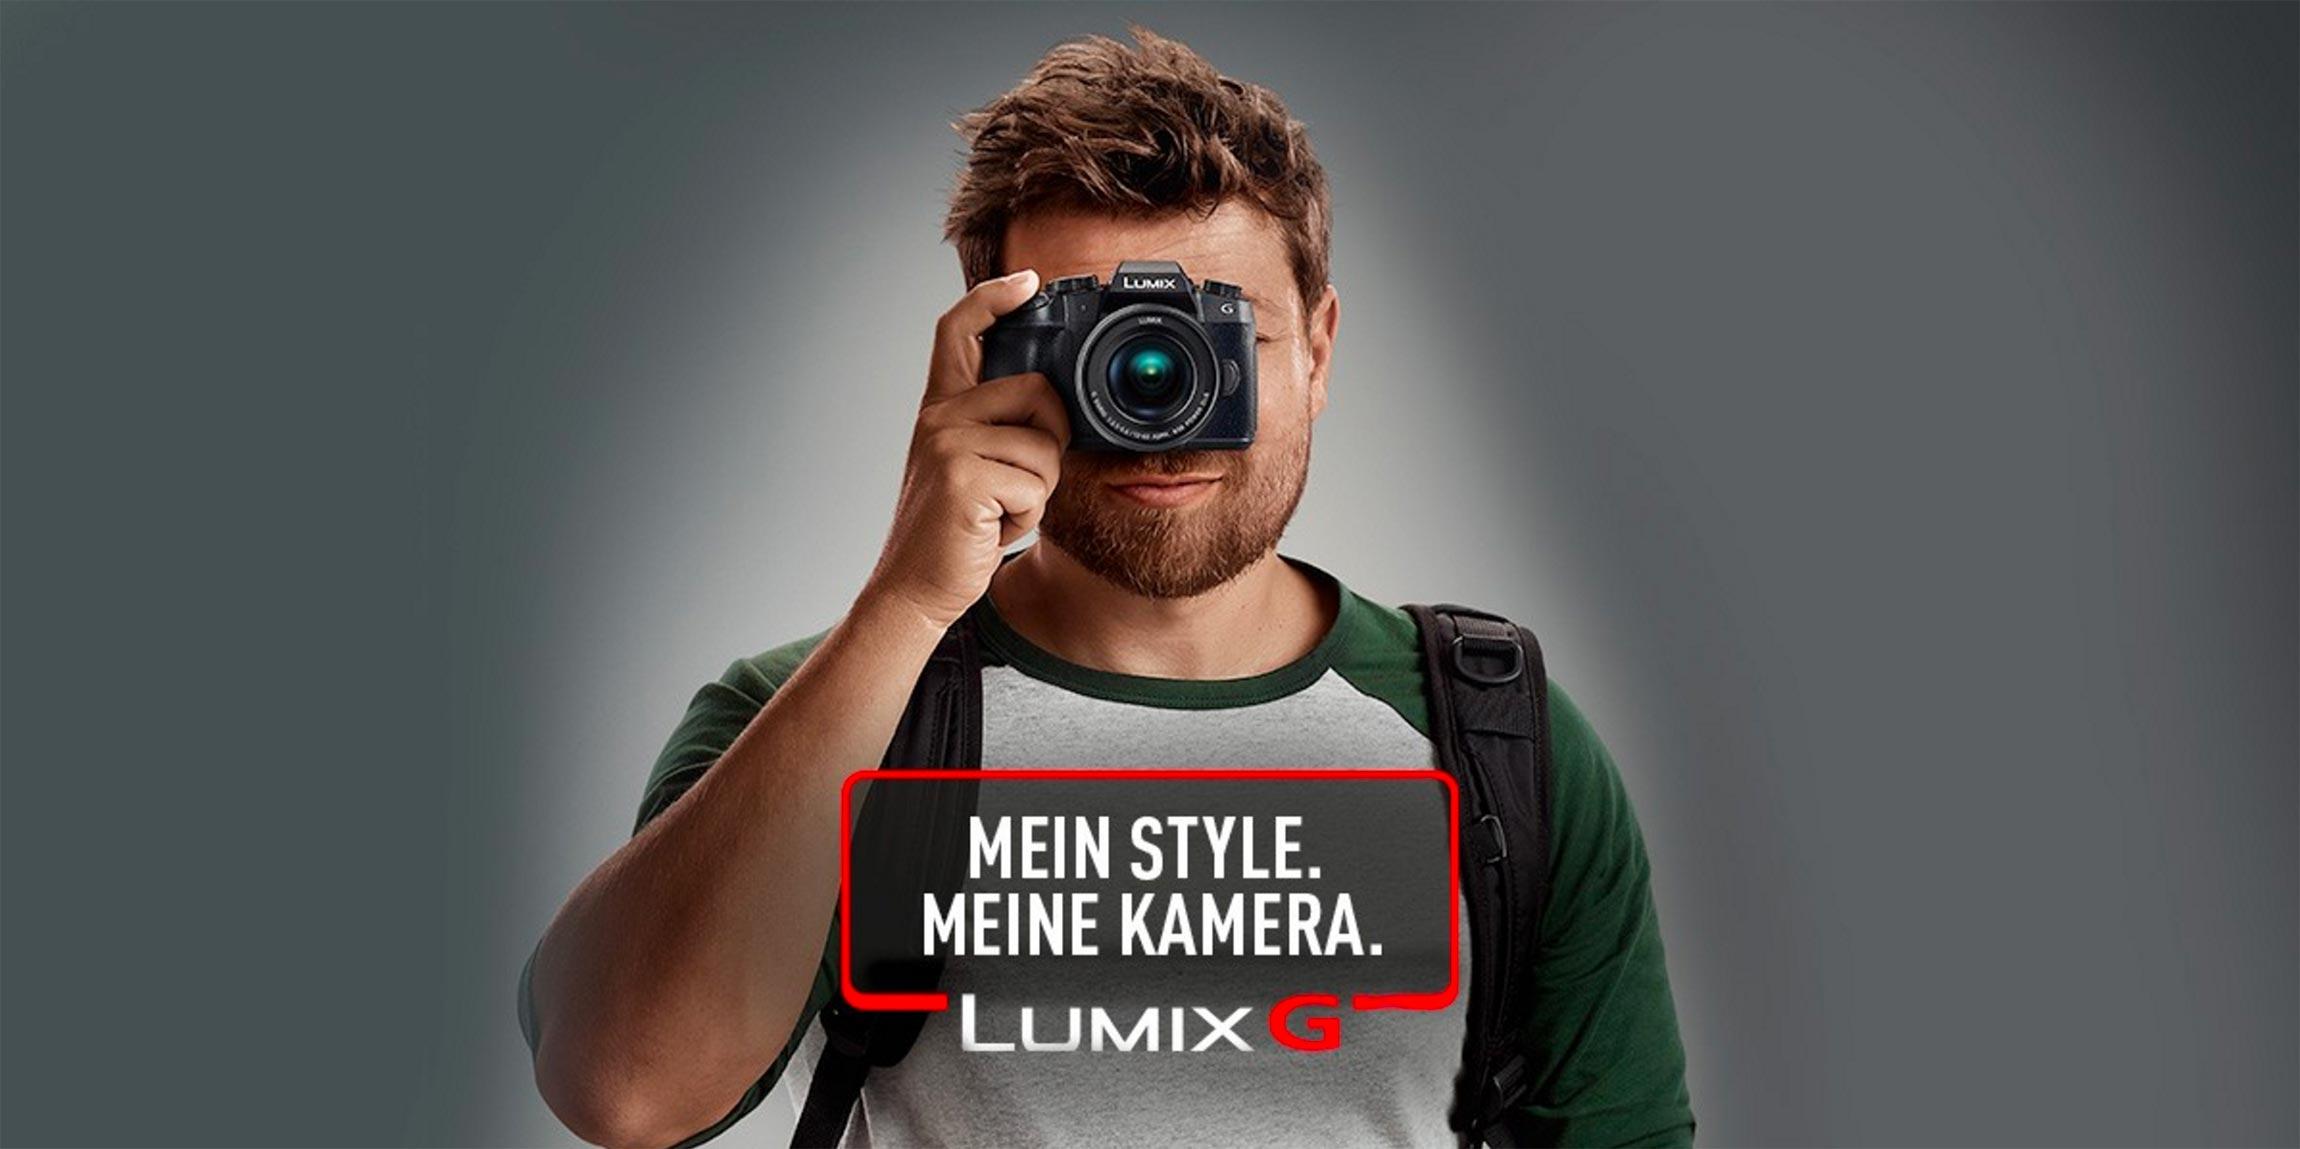 Panasonic-website-Lumix-G80